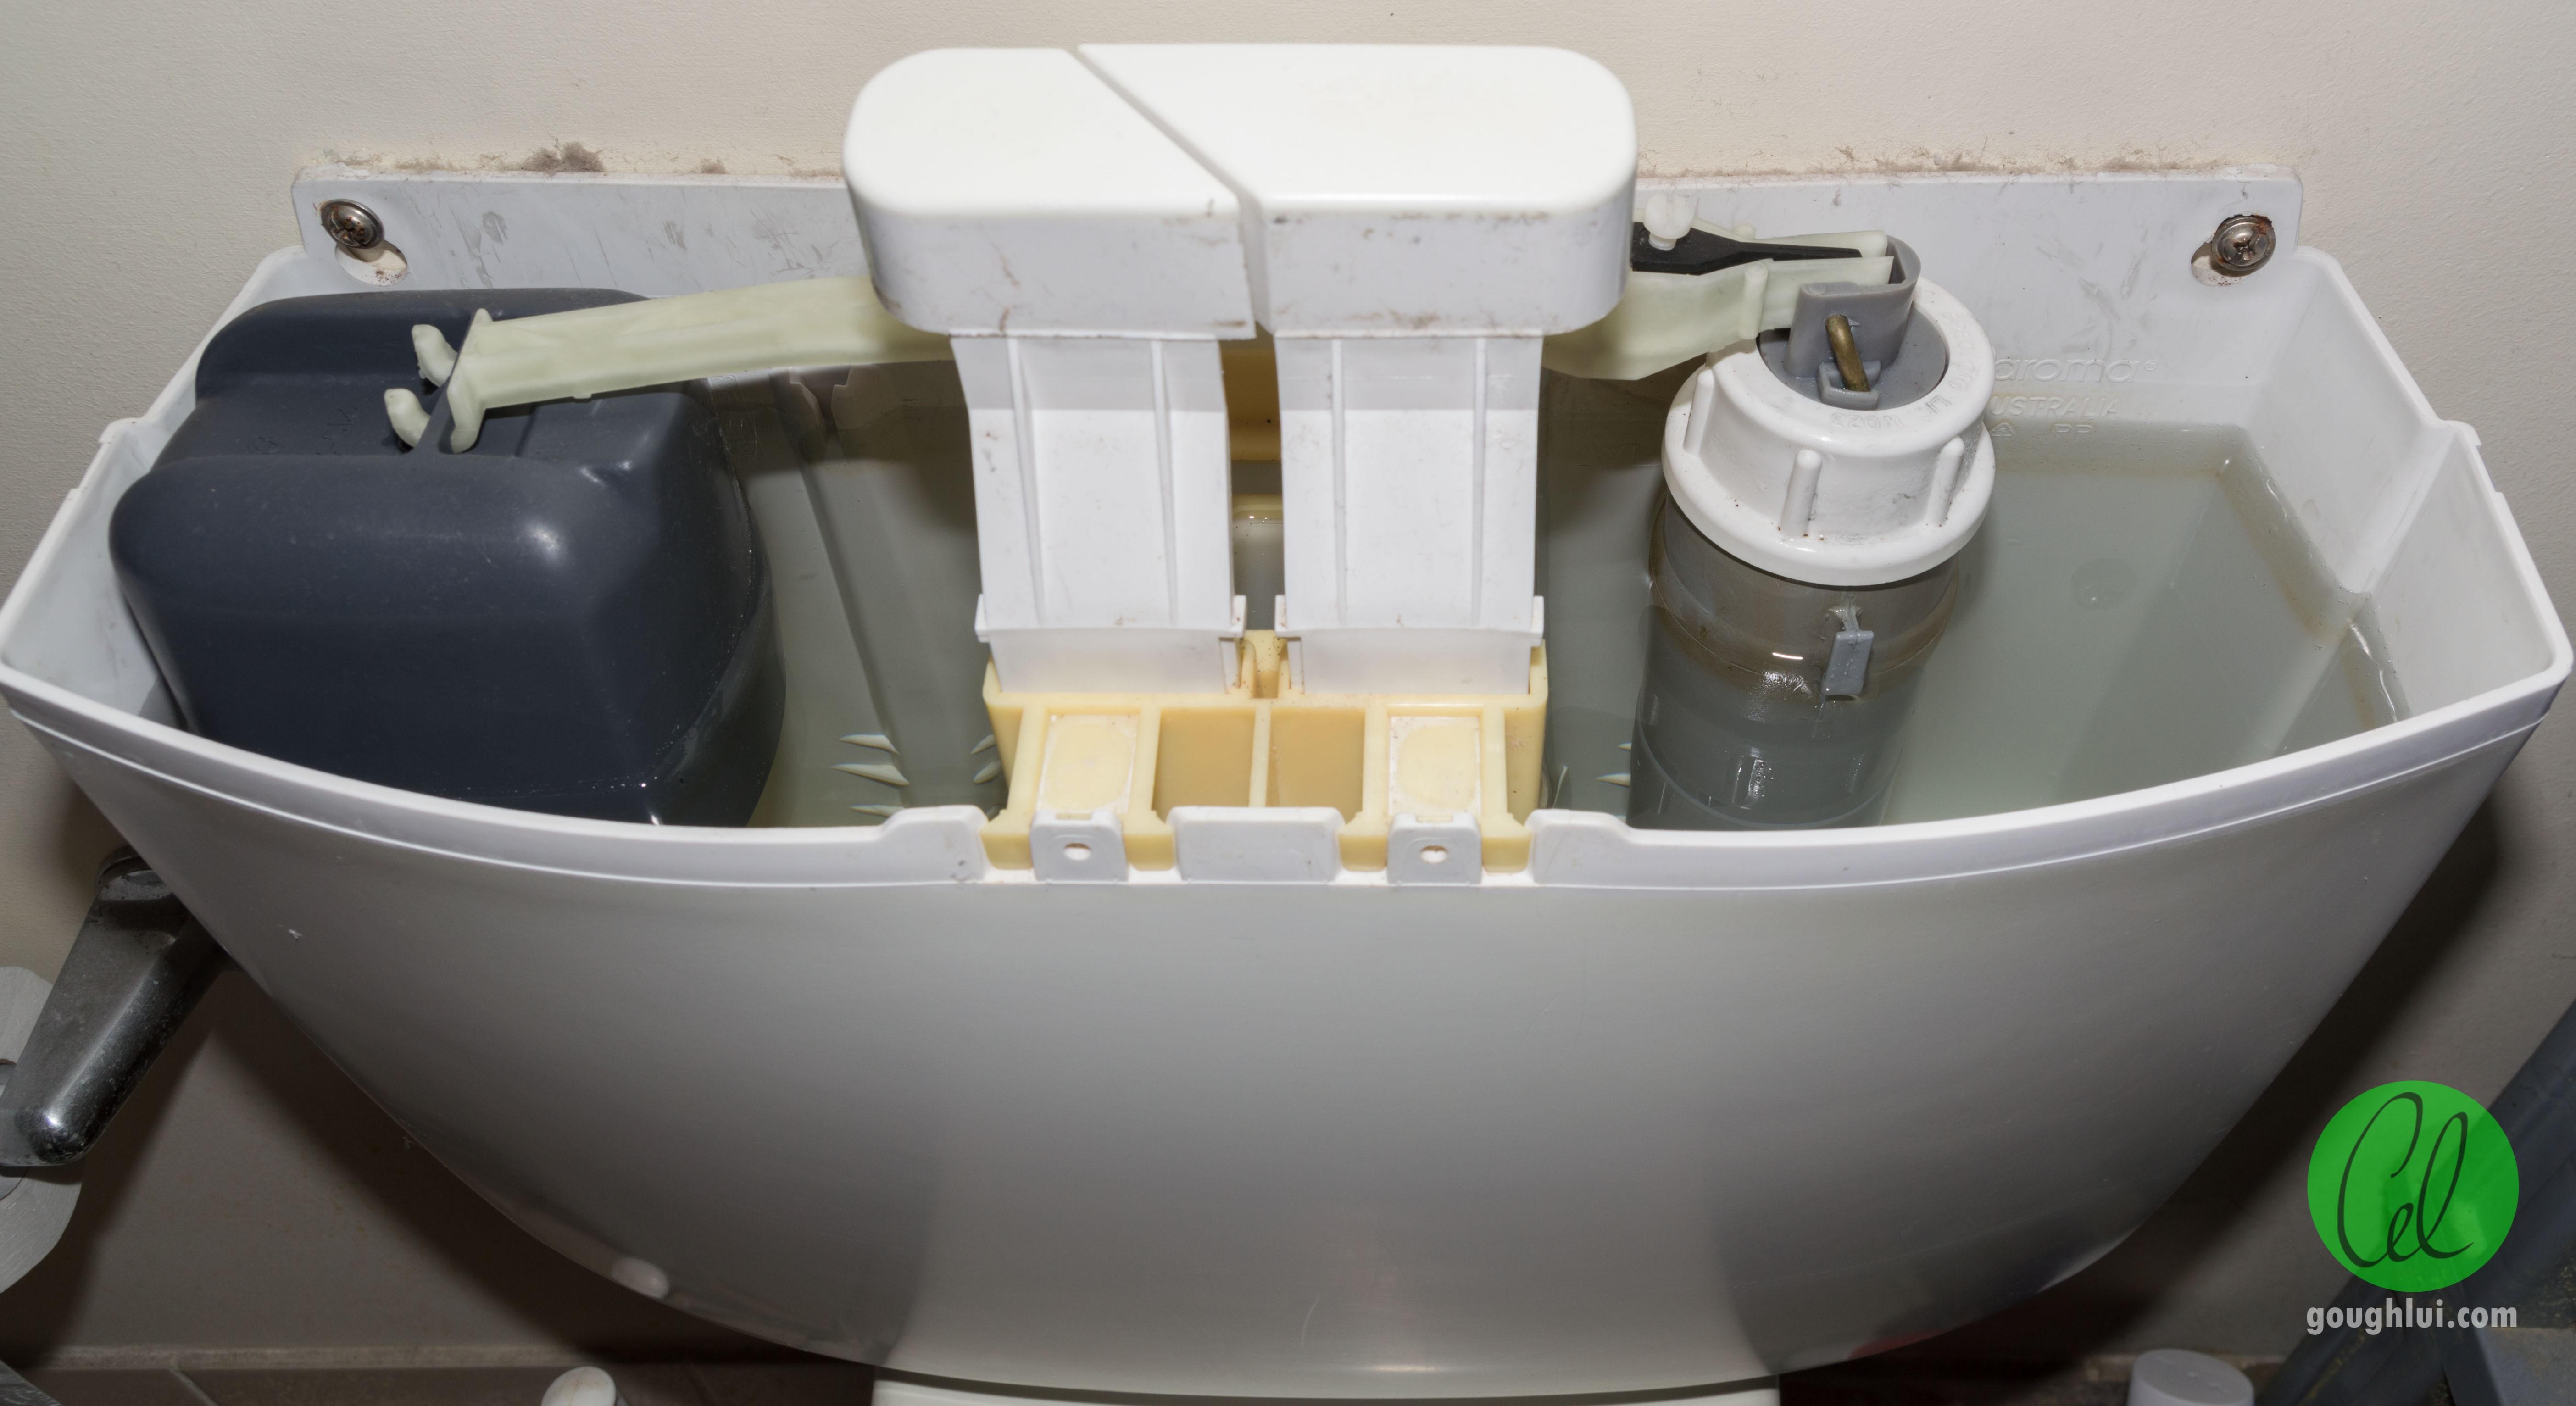 Caroma toilet Parts Diagram Project Caroma Slimline Dual Flush Cistern Inlet Valve Replacement Of Caroma toilet Parts Diagram